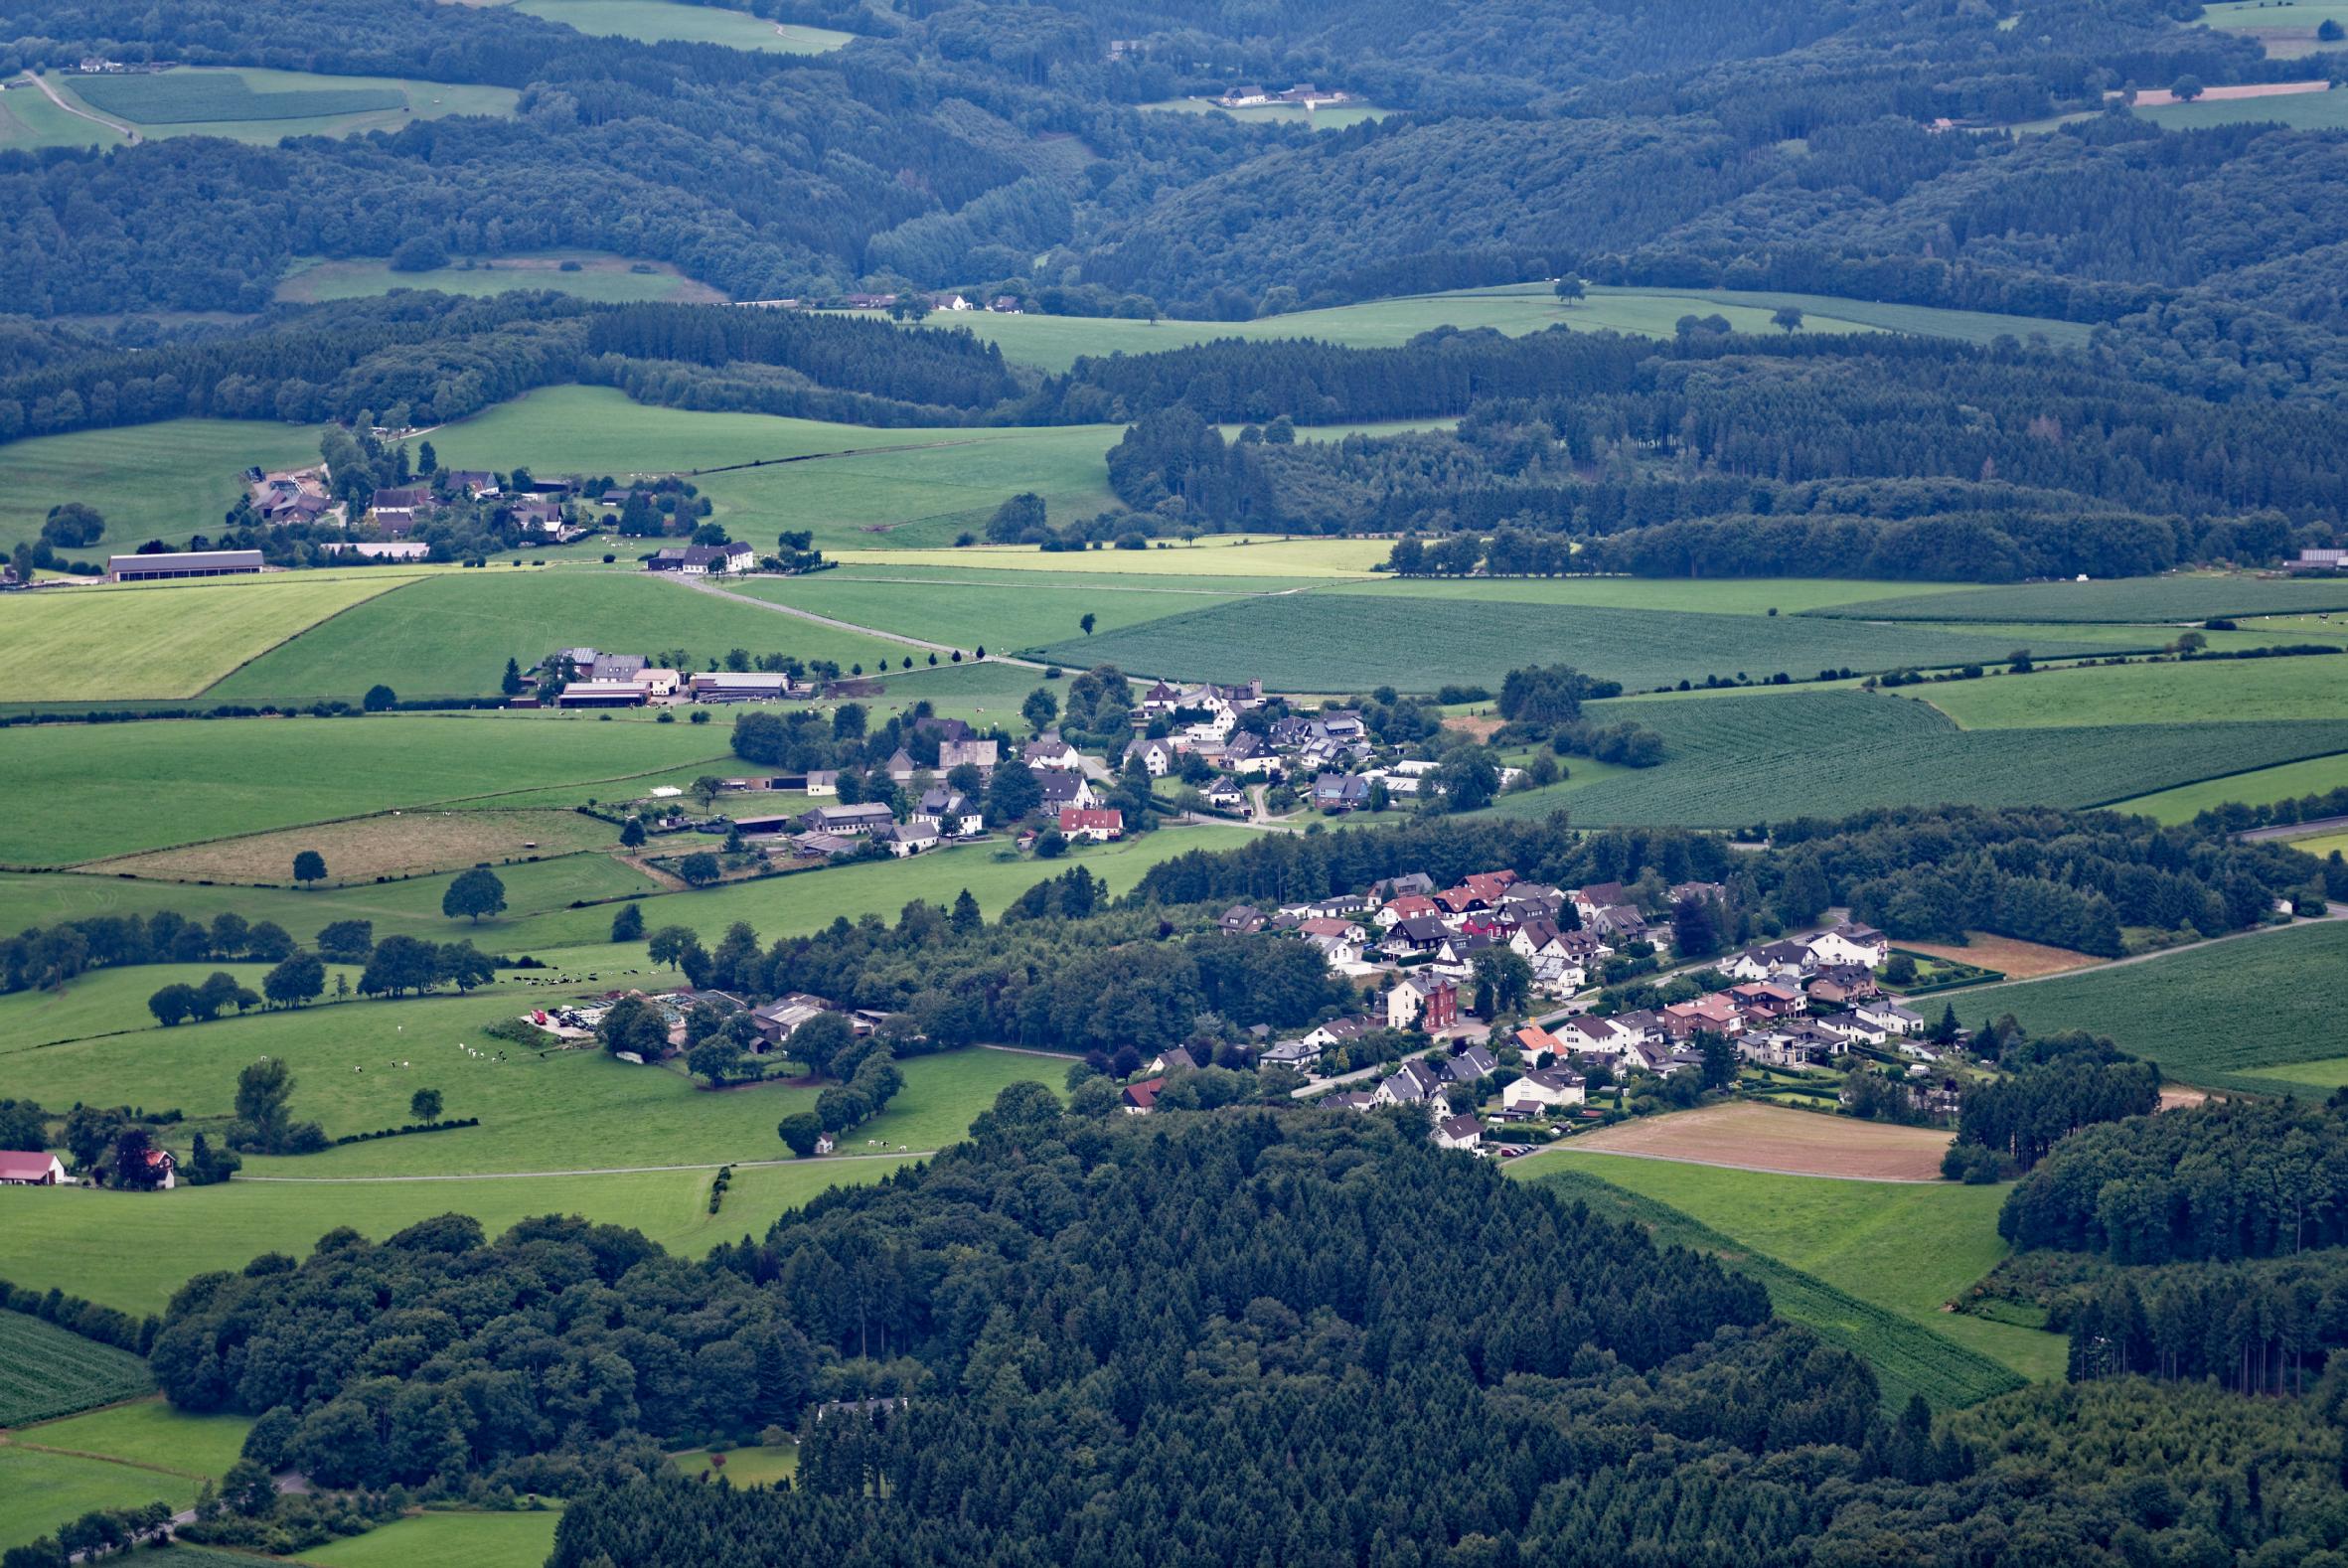 pity, Tschechische frauen zum kennenlernen all can